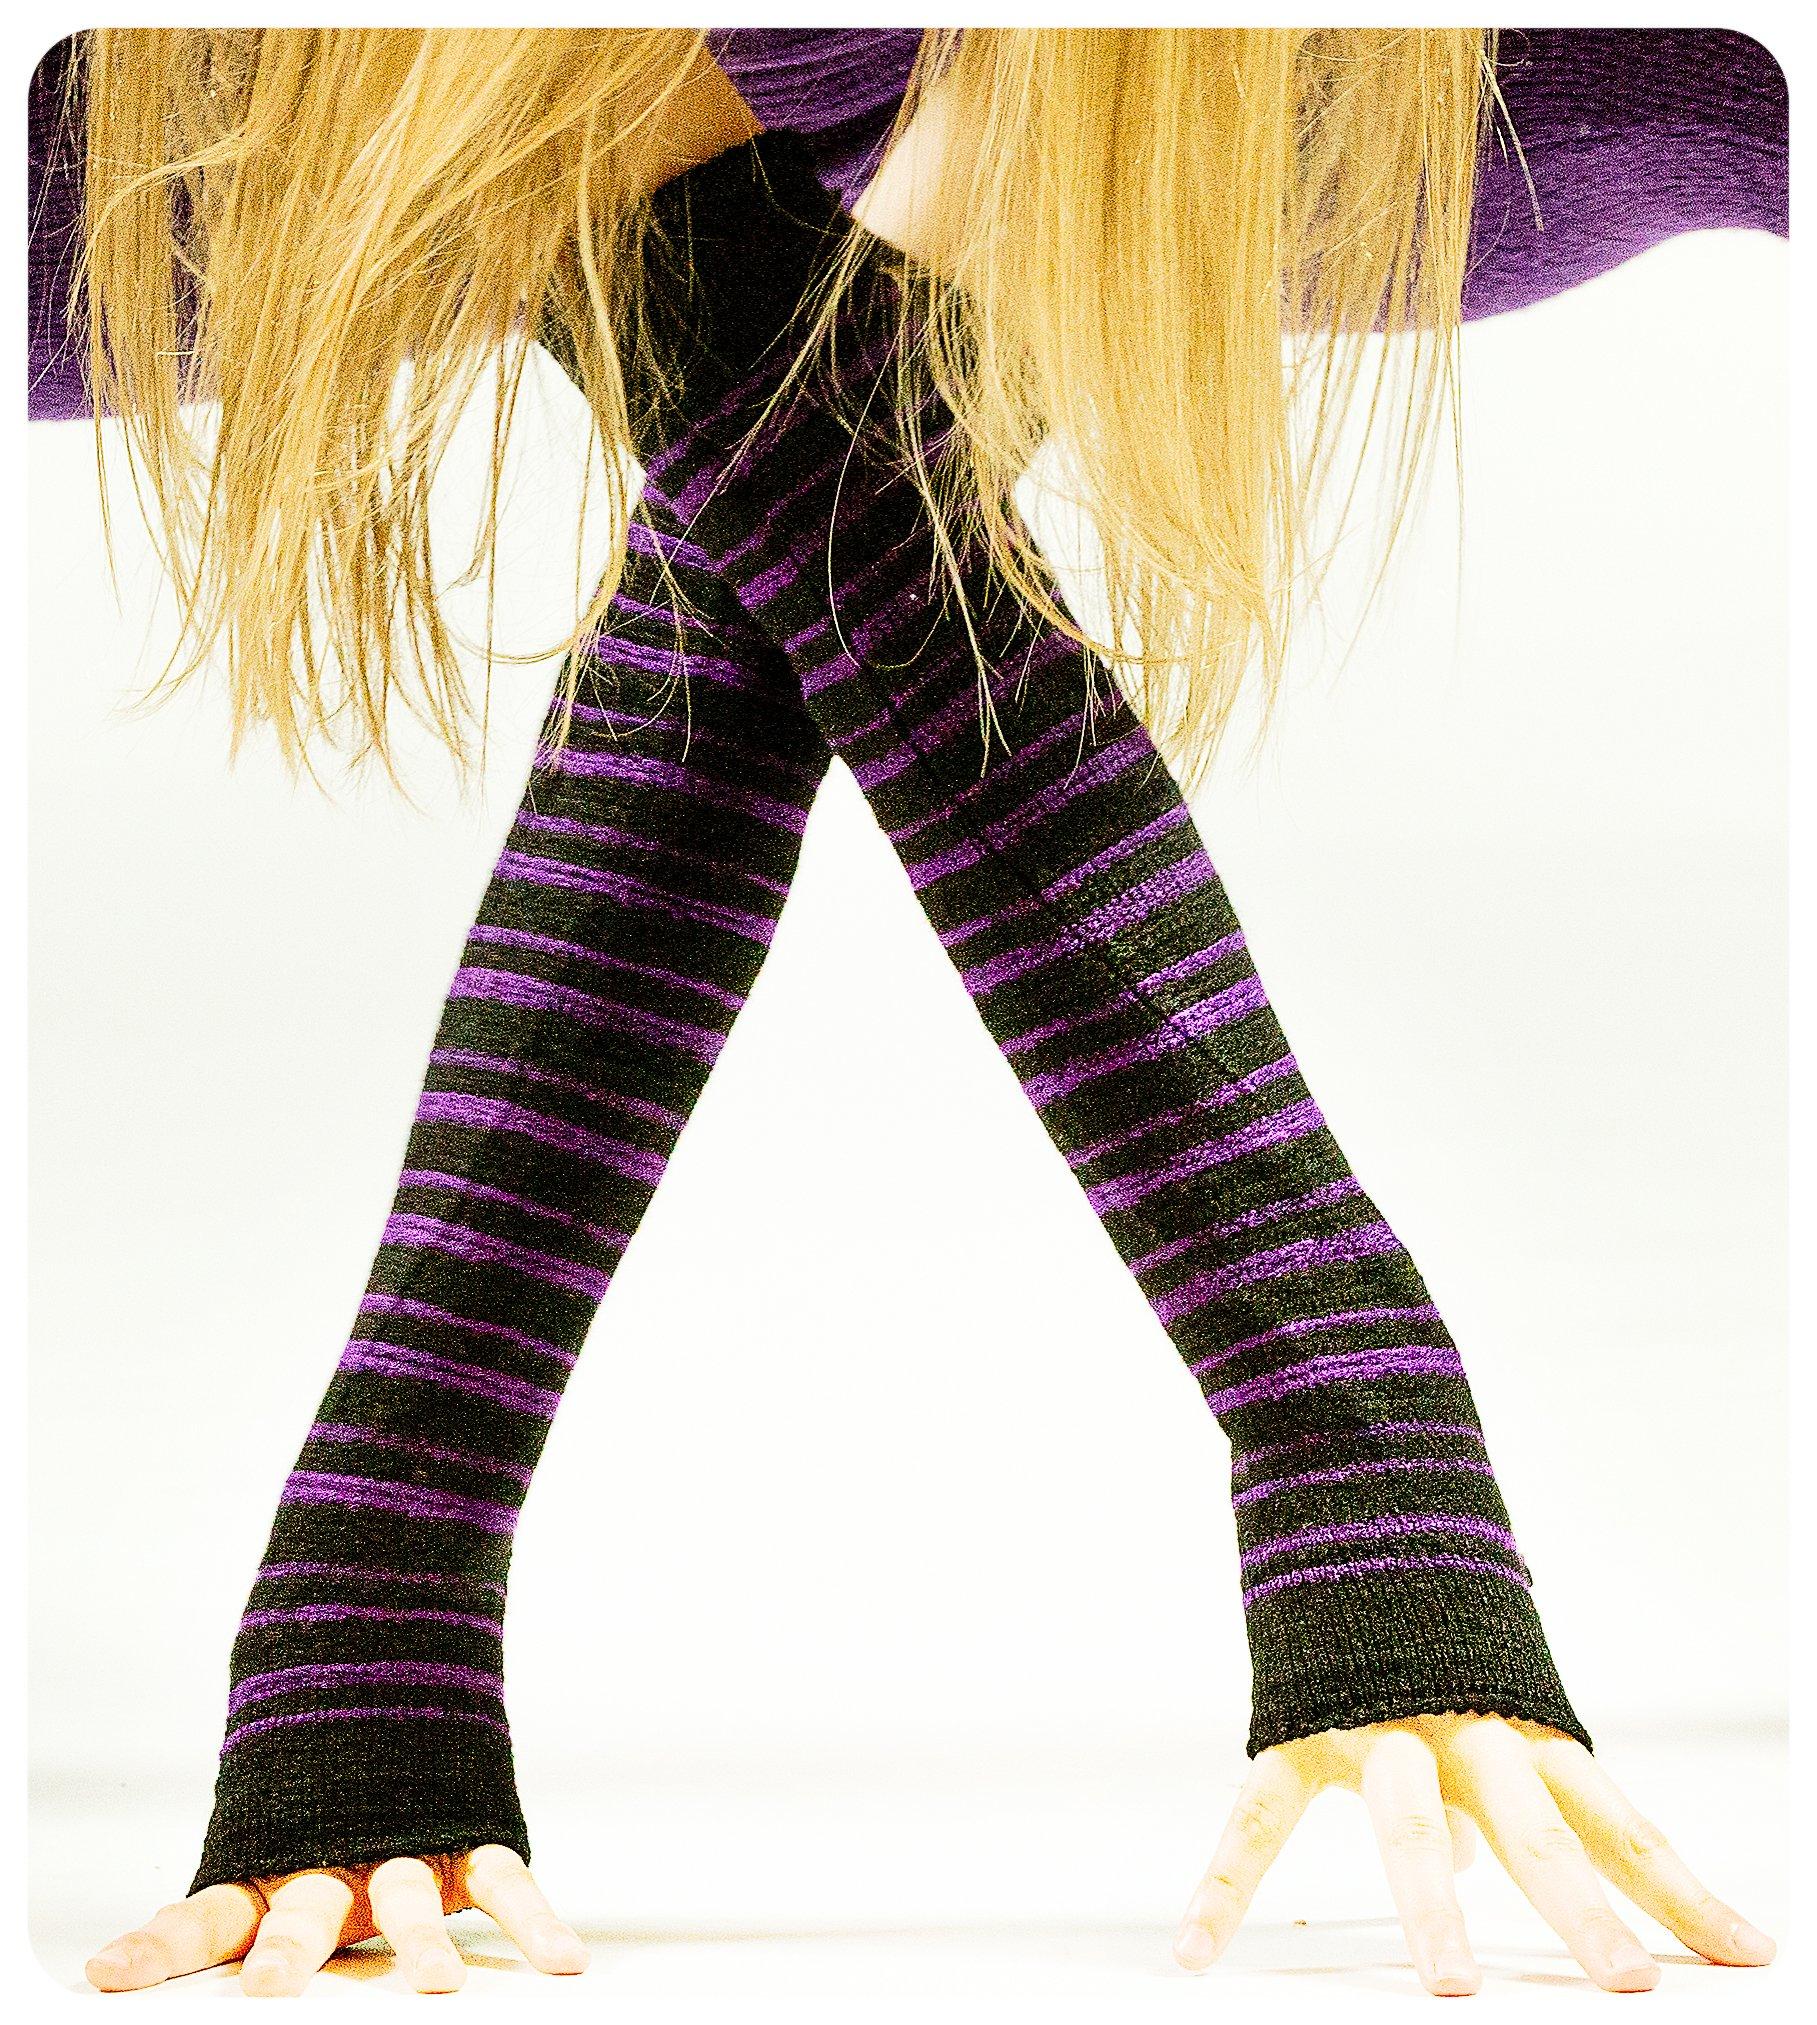 Black & Purple Striped Arm Warmer KD dance New York Sexy, Fashionable & Fingerless Arm Warmers Thumb Hole #MadeInUSA Happy New Year 2018 @KDdanceNewYork by KD dance New York (Image #3)